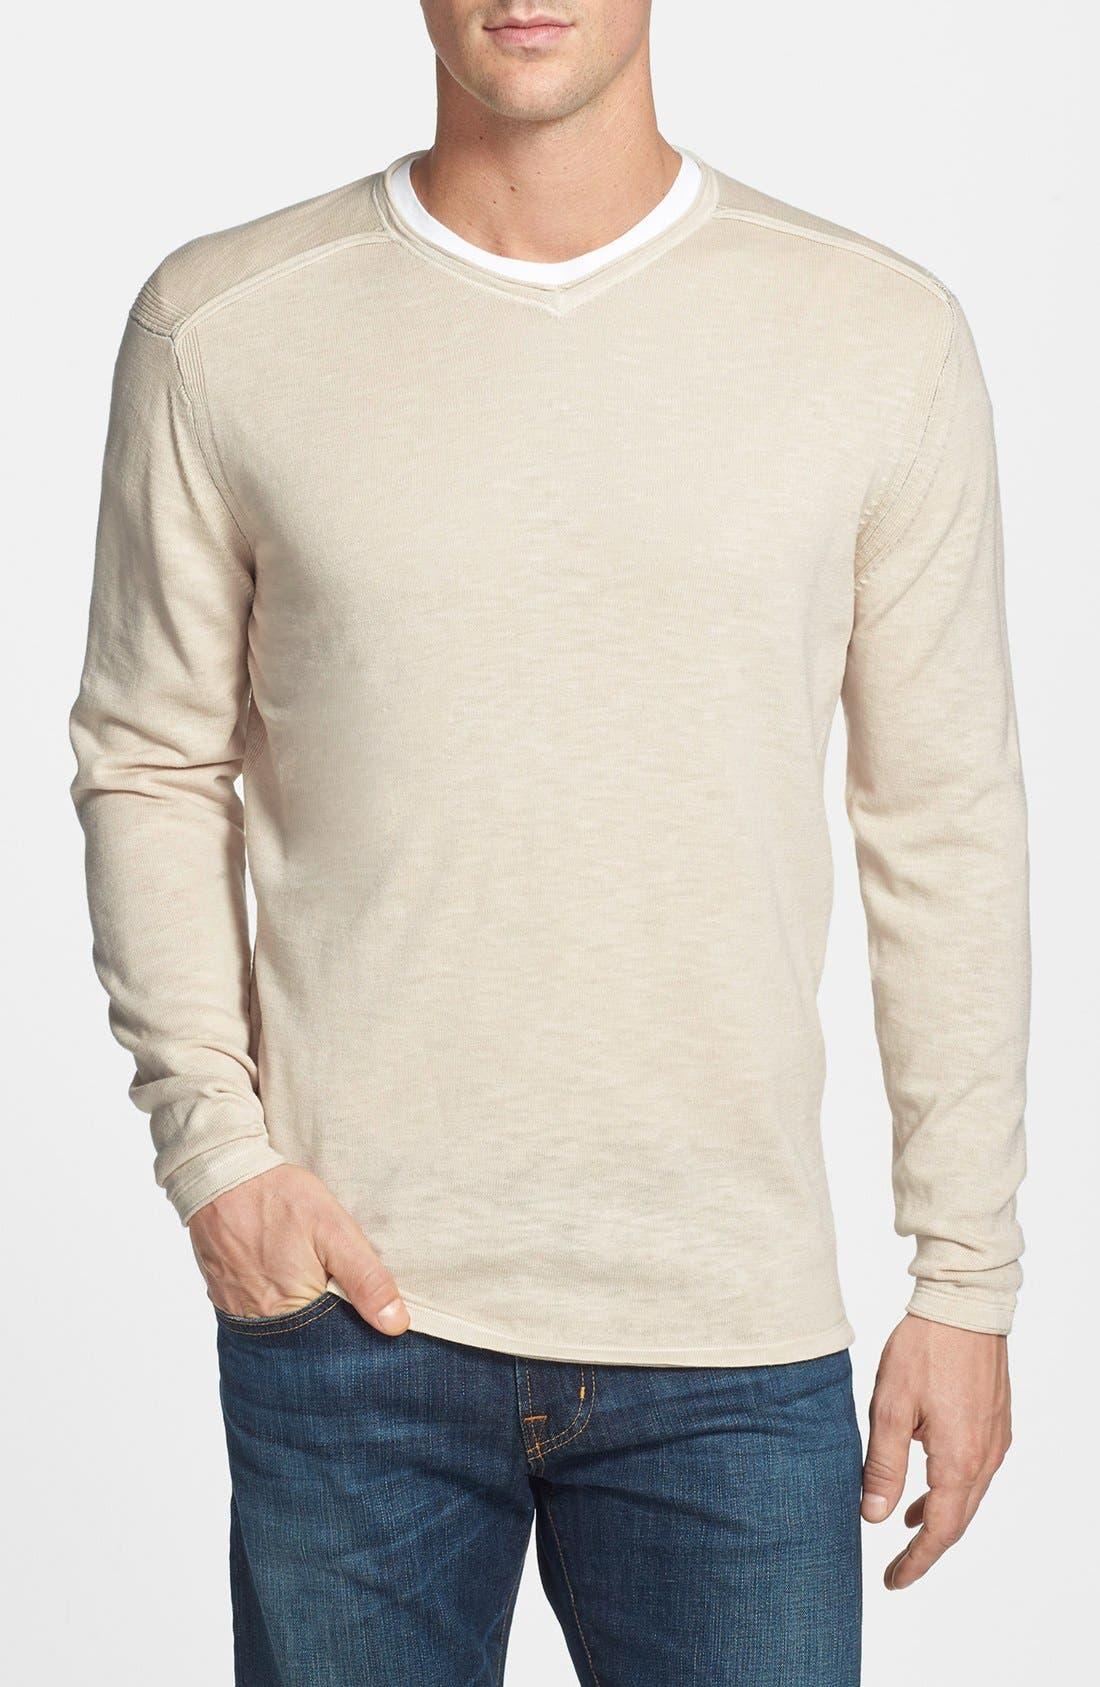 Main Image - Tommy Bahama Denim 'Sandstone Beach' Cotton V-Neck Sweatshirt